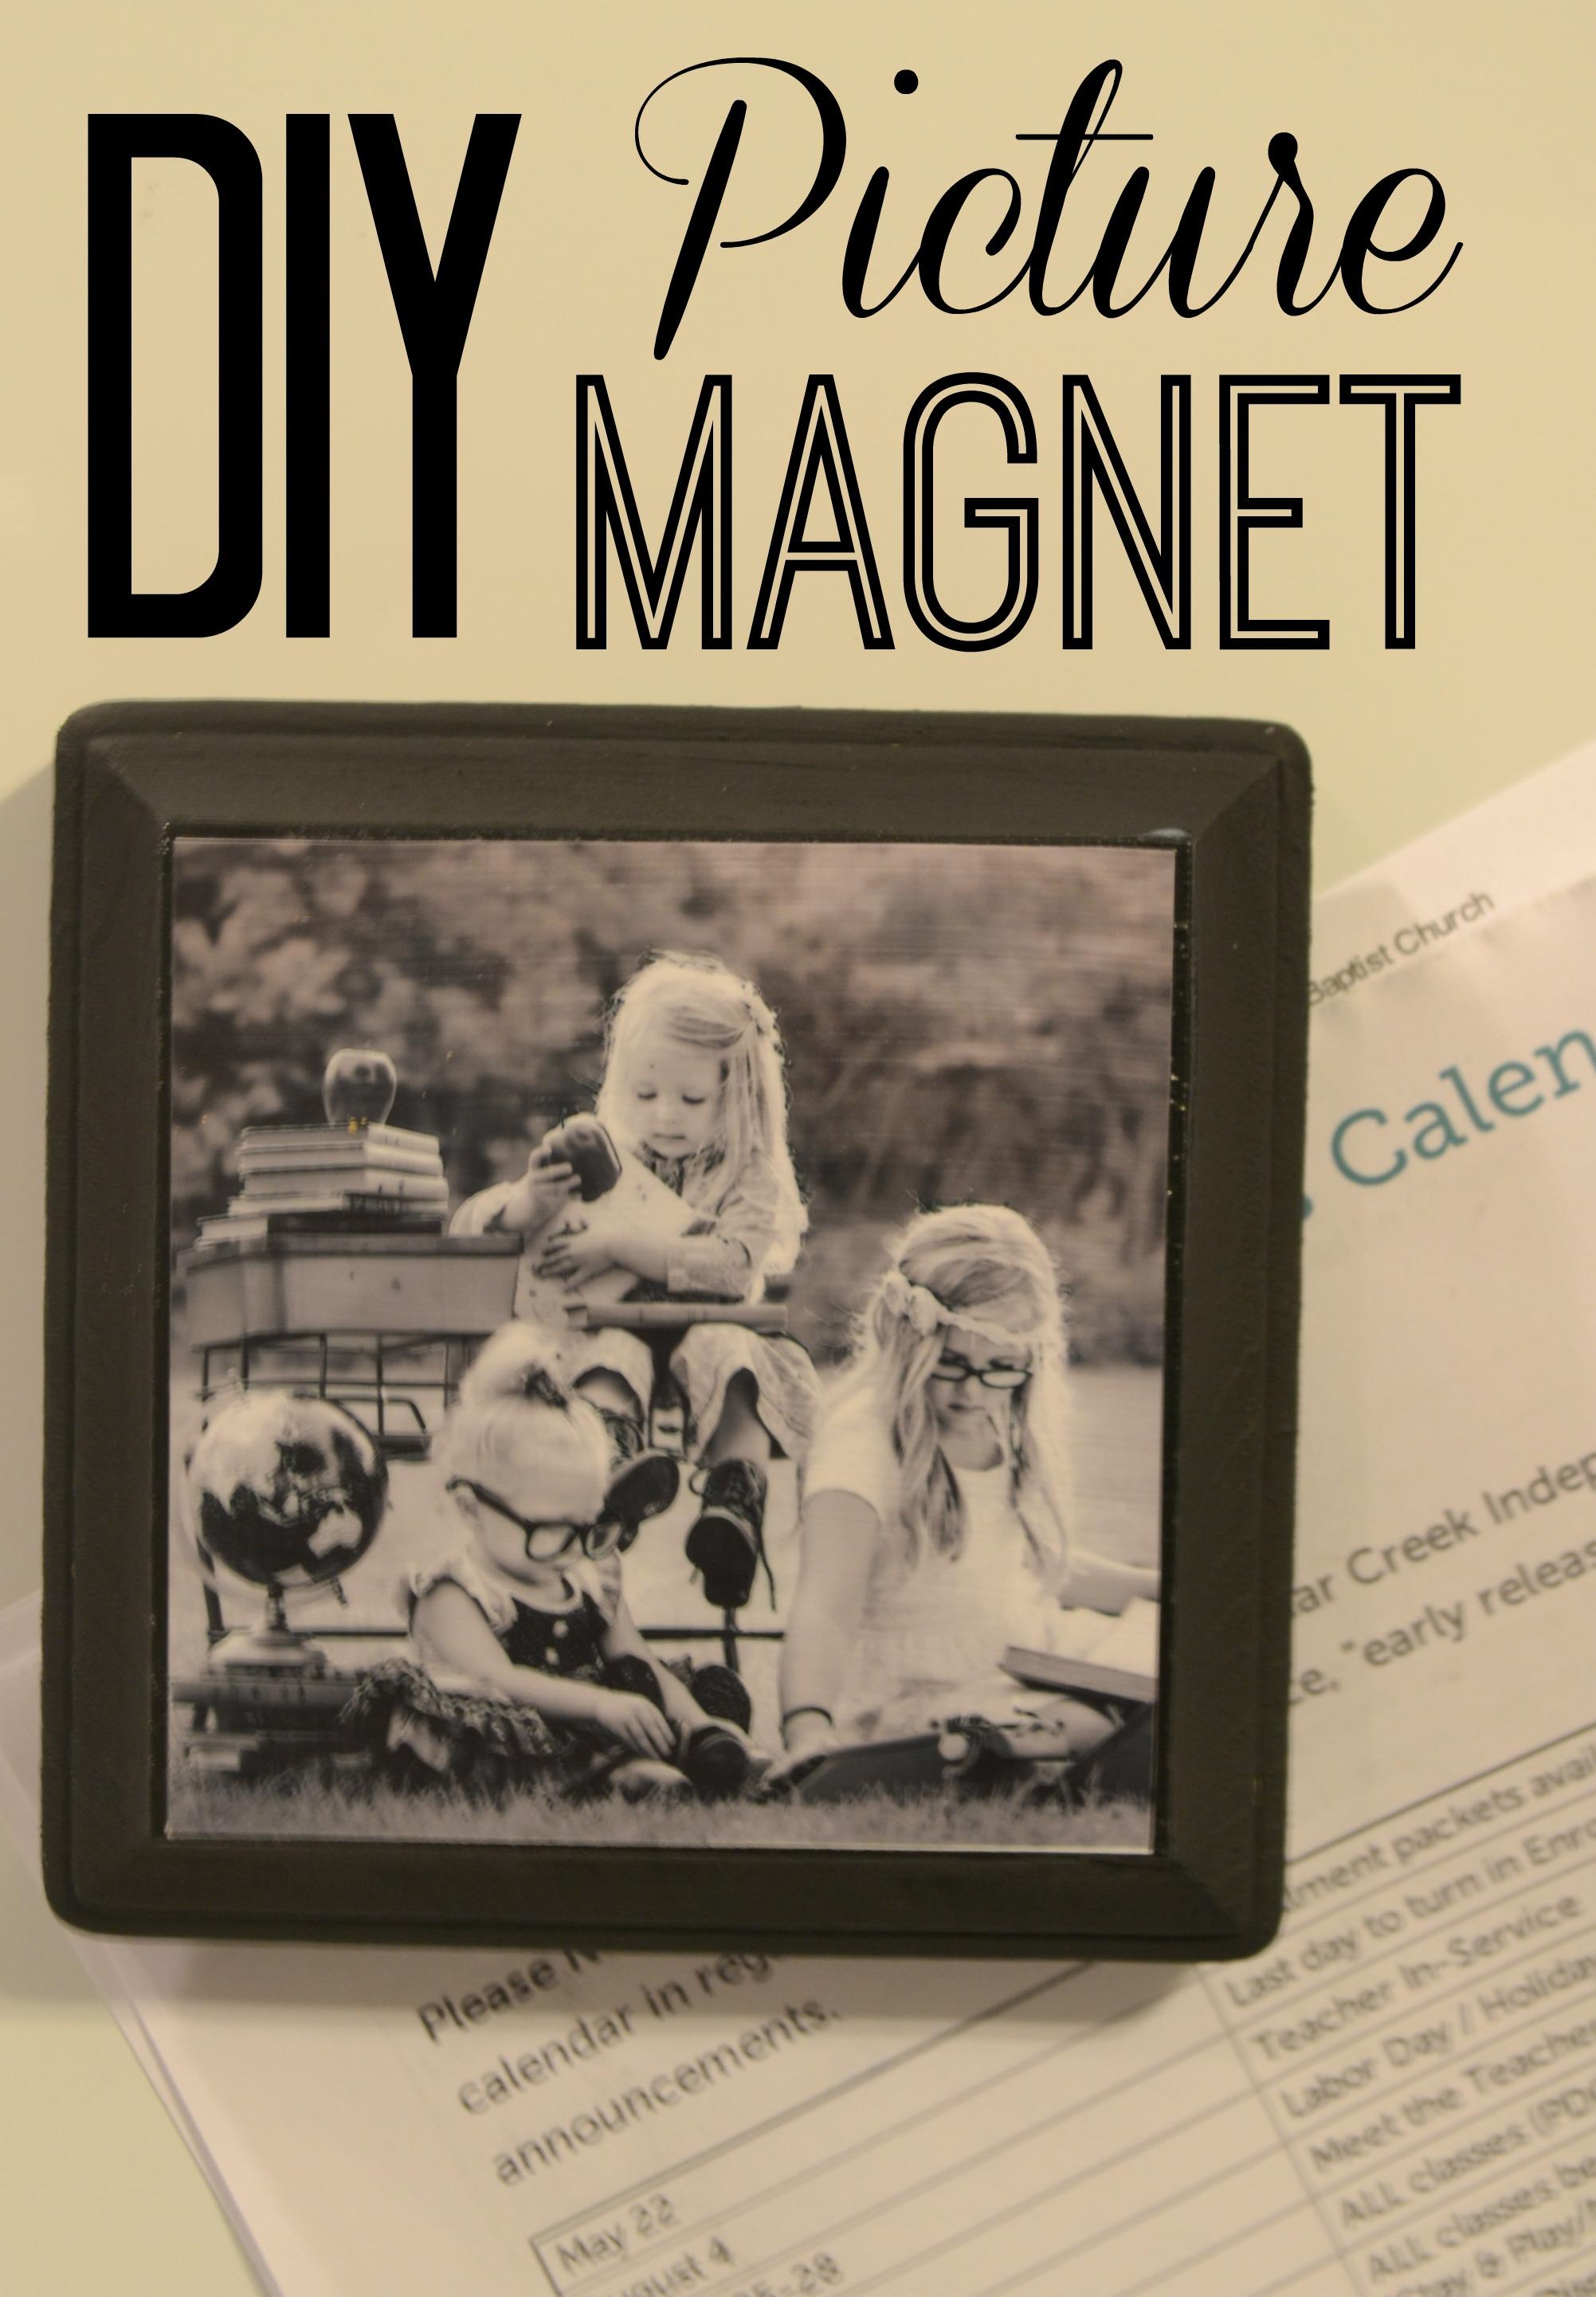 DIY Picture Magnet